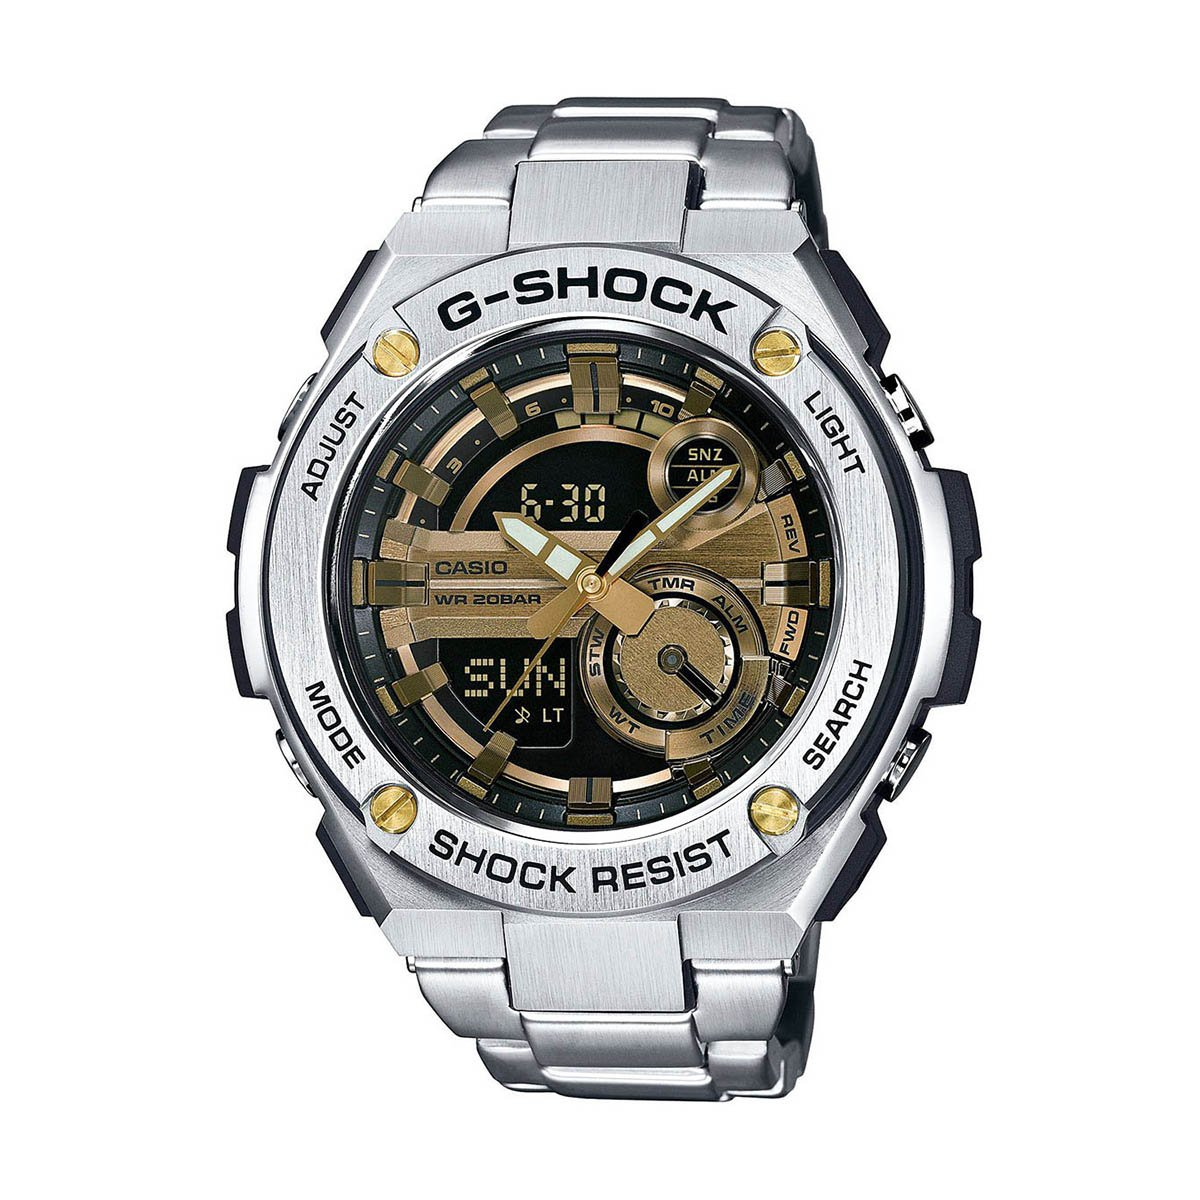 G-Shock GST-210D-9A G-Steel Series Luxury Watch - Silver/Gold / One Size